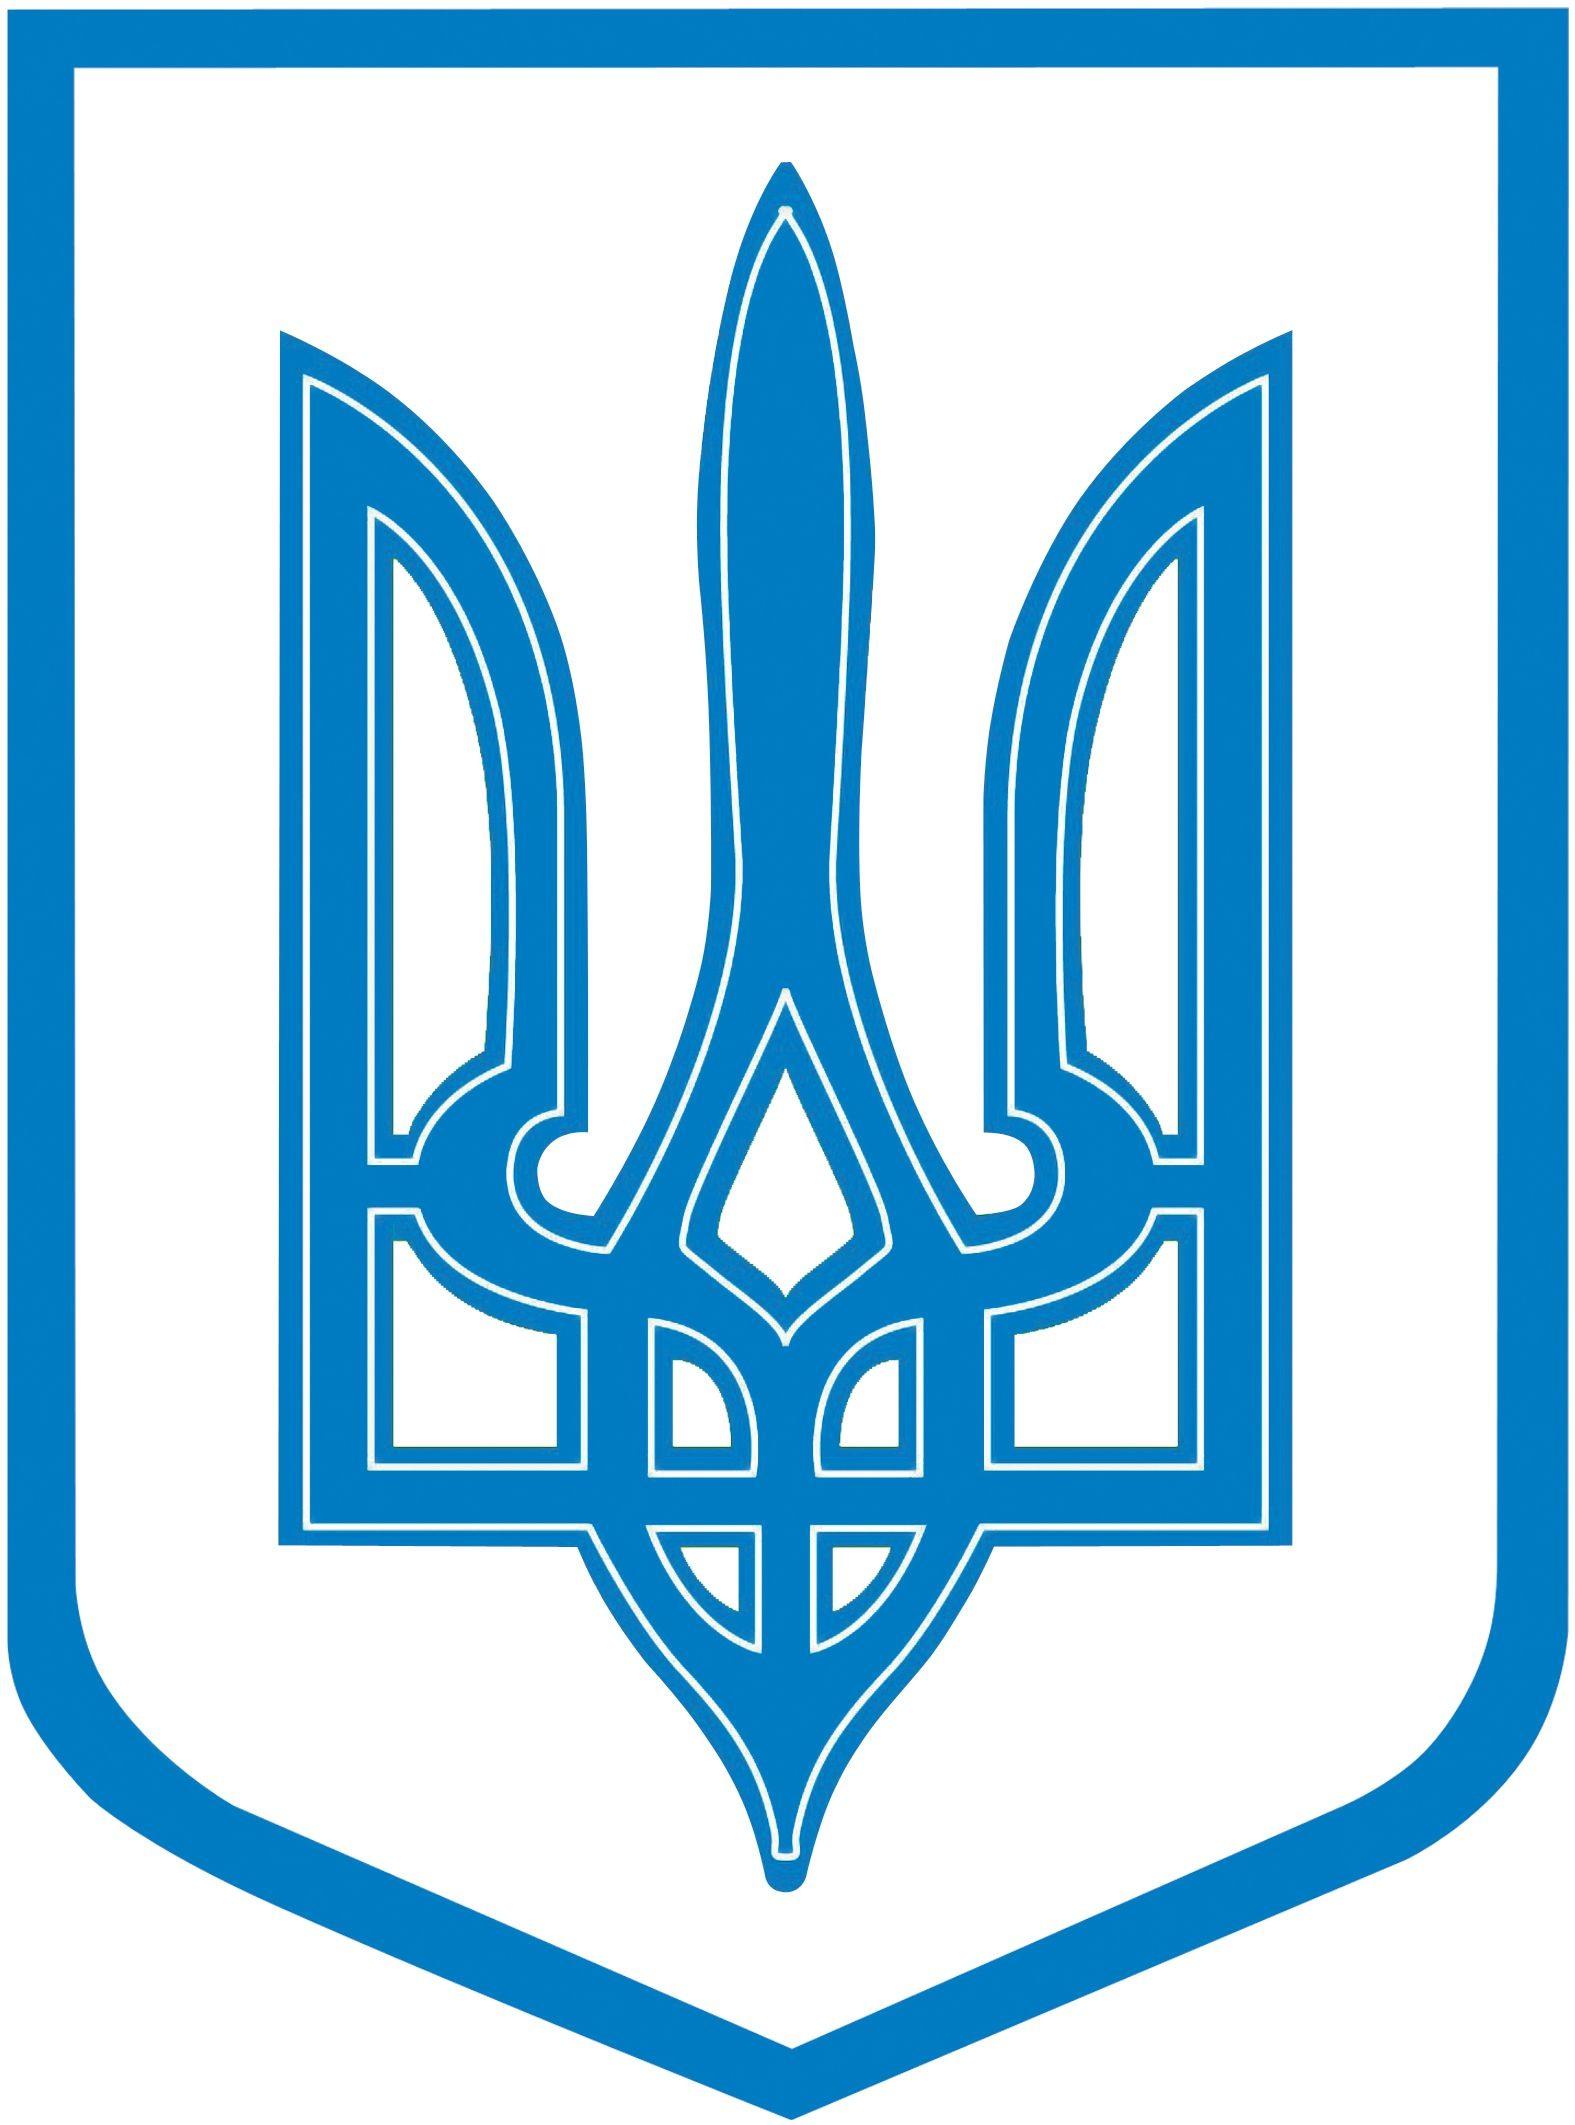 картинка герб украины на прозрачном фоне типу